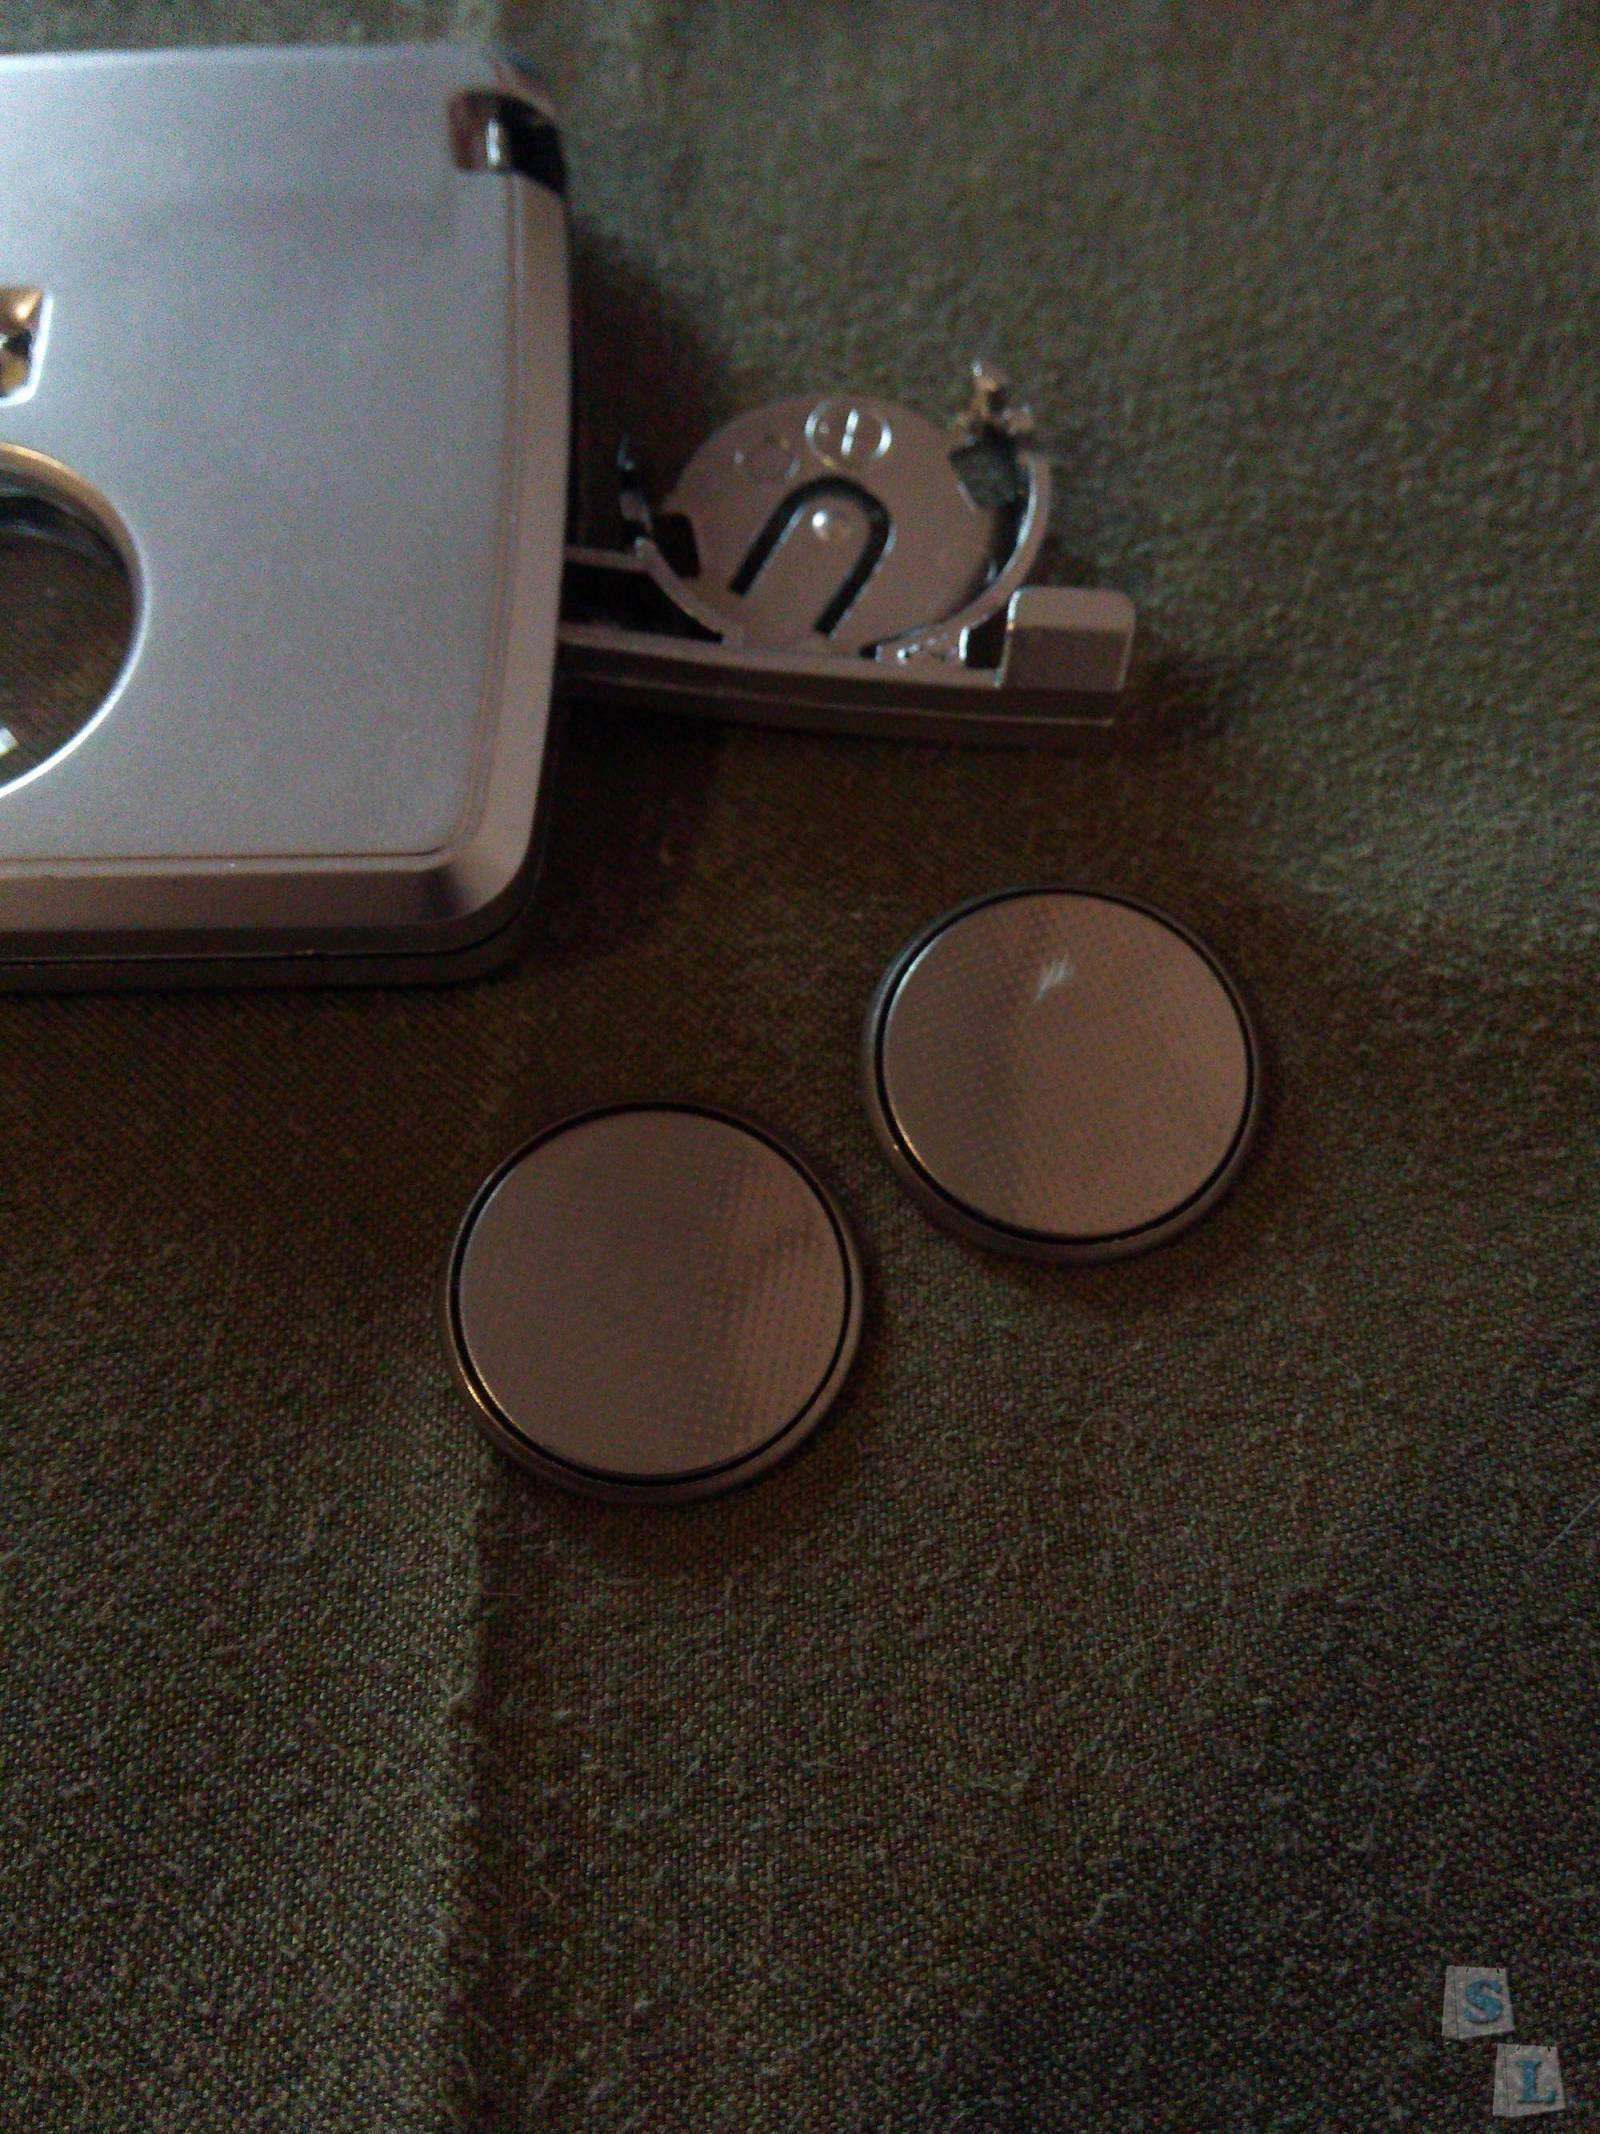 TinyDeal: 3x и 6x кратная лупа с подсветкой